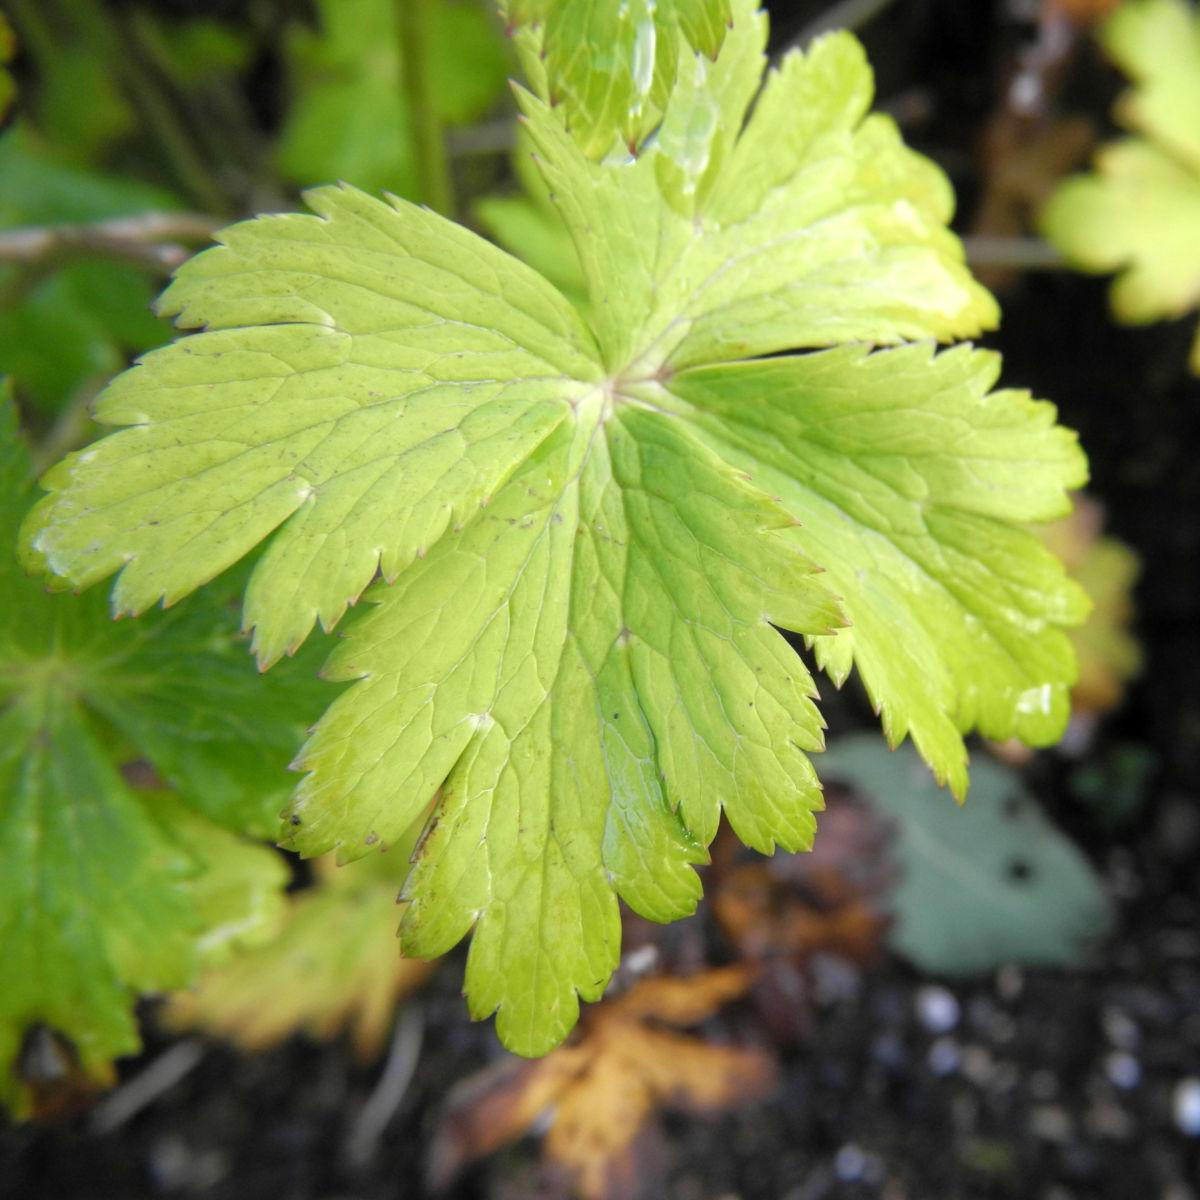 Hondo Trollblume Blatt gruen Trollius hondoensis